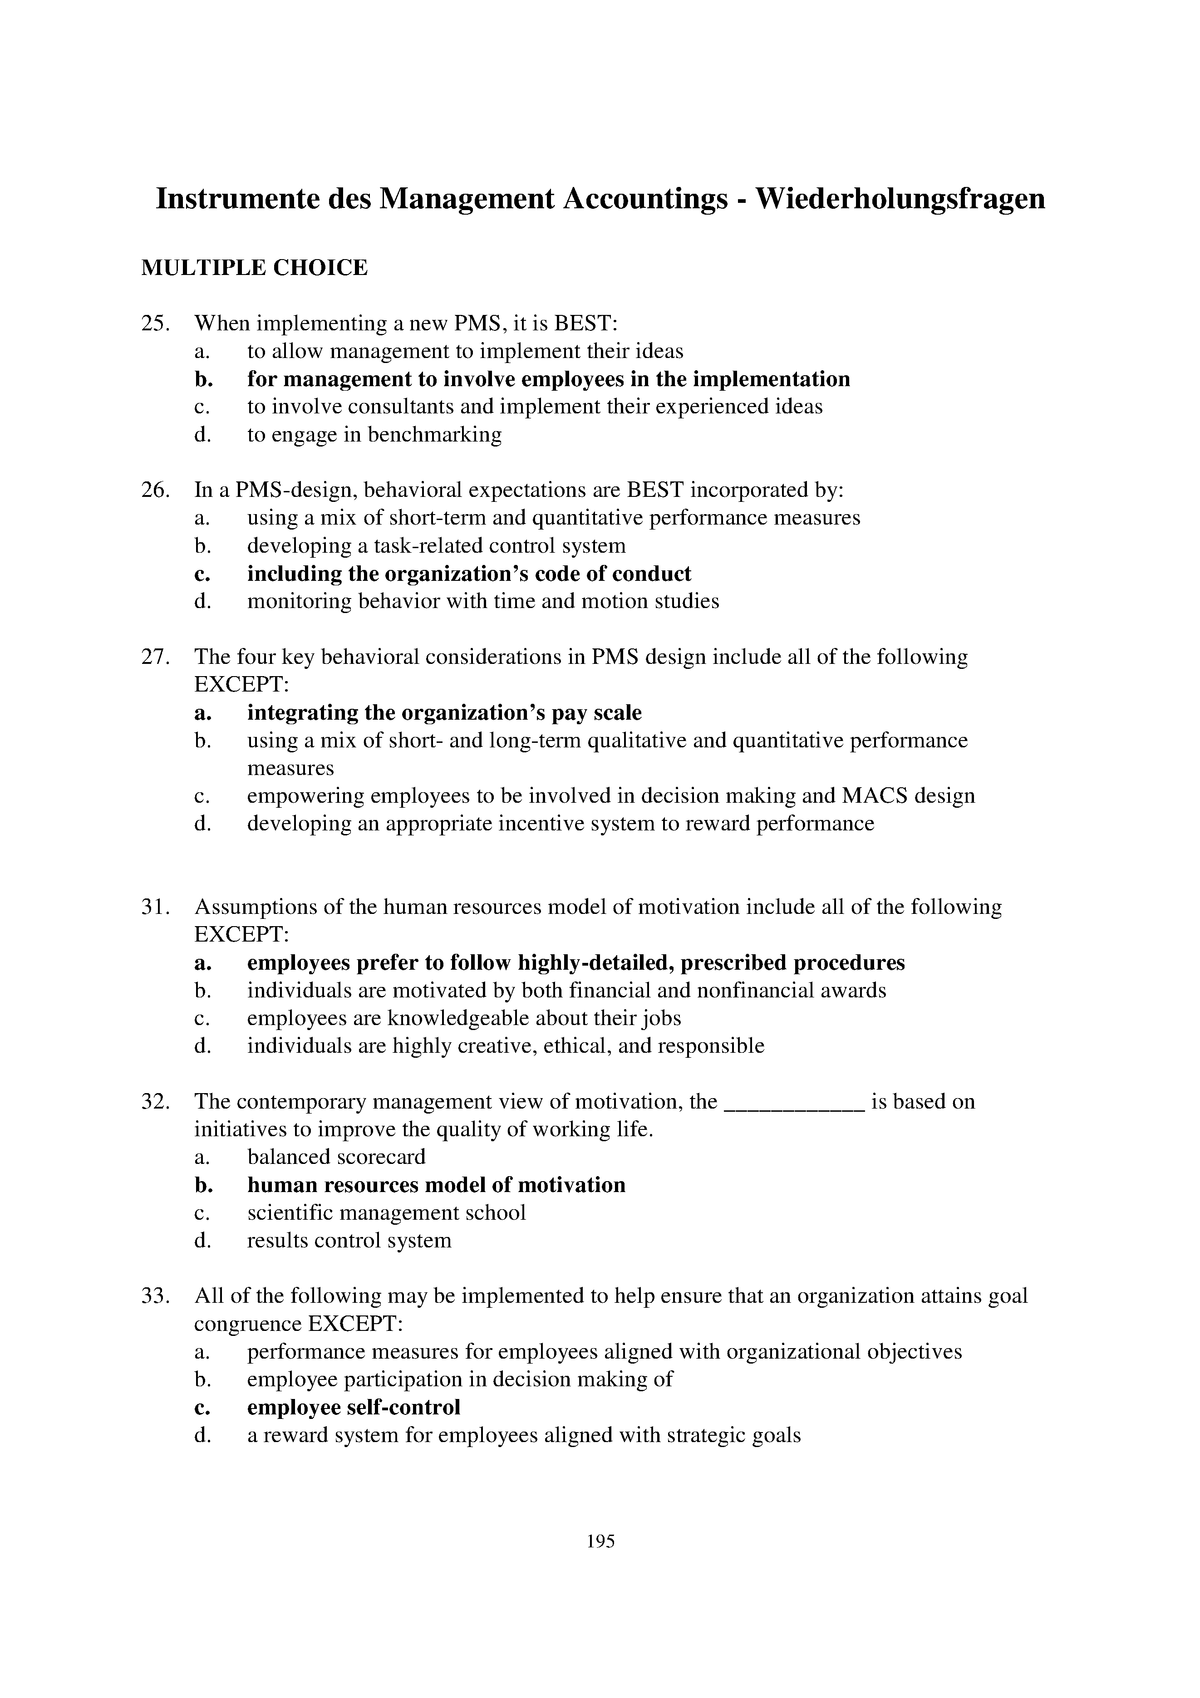 Man Acc Übungsfragen - MA 4 14: Management Accounting - StuDocu